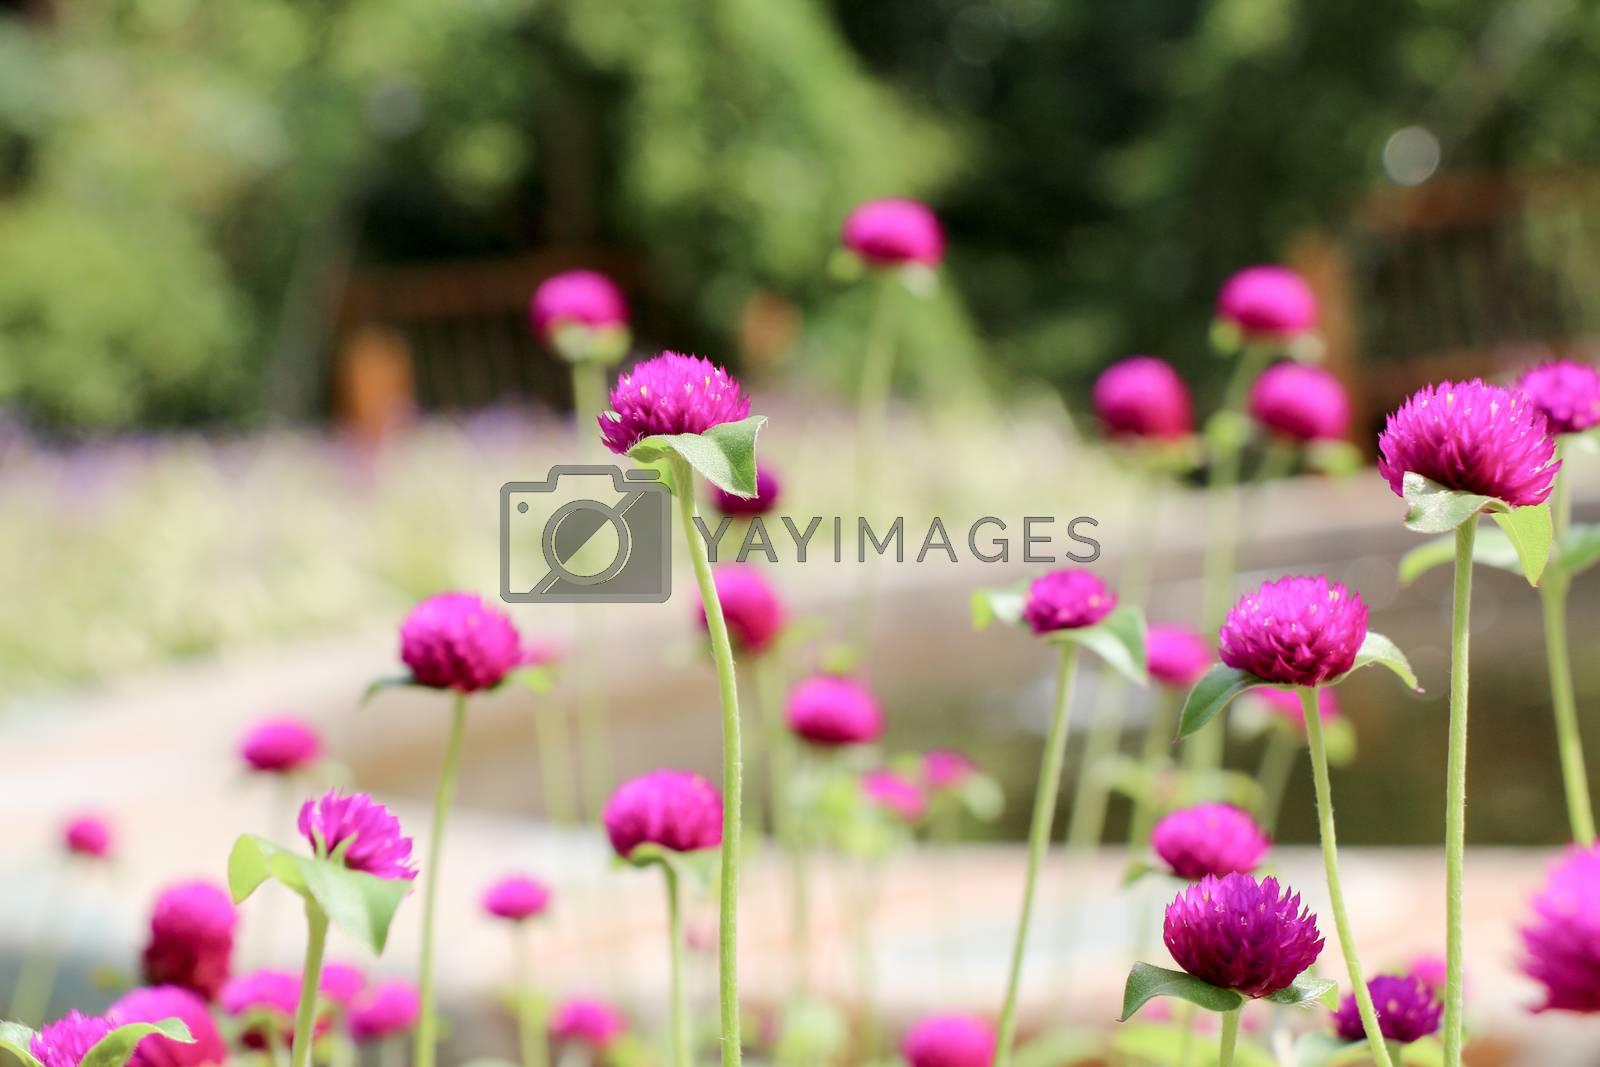 Beautifu lGlobe amaranths,  Amaranthaceae flowers in nature background